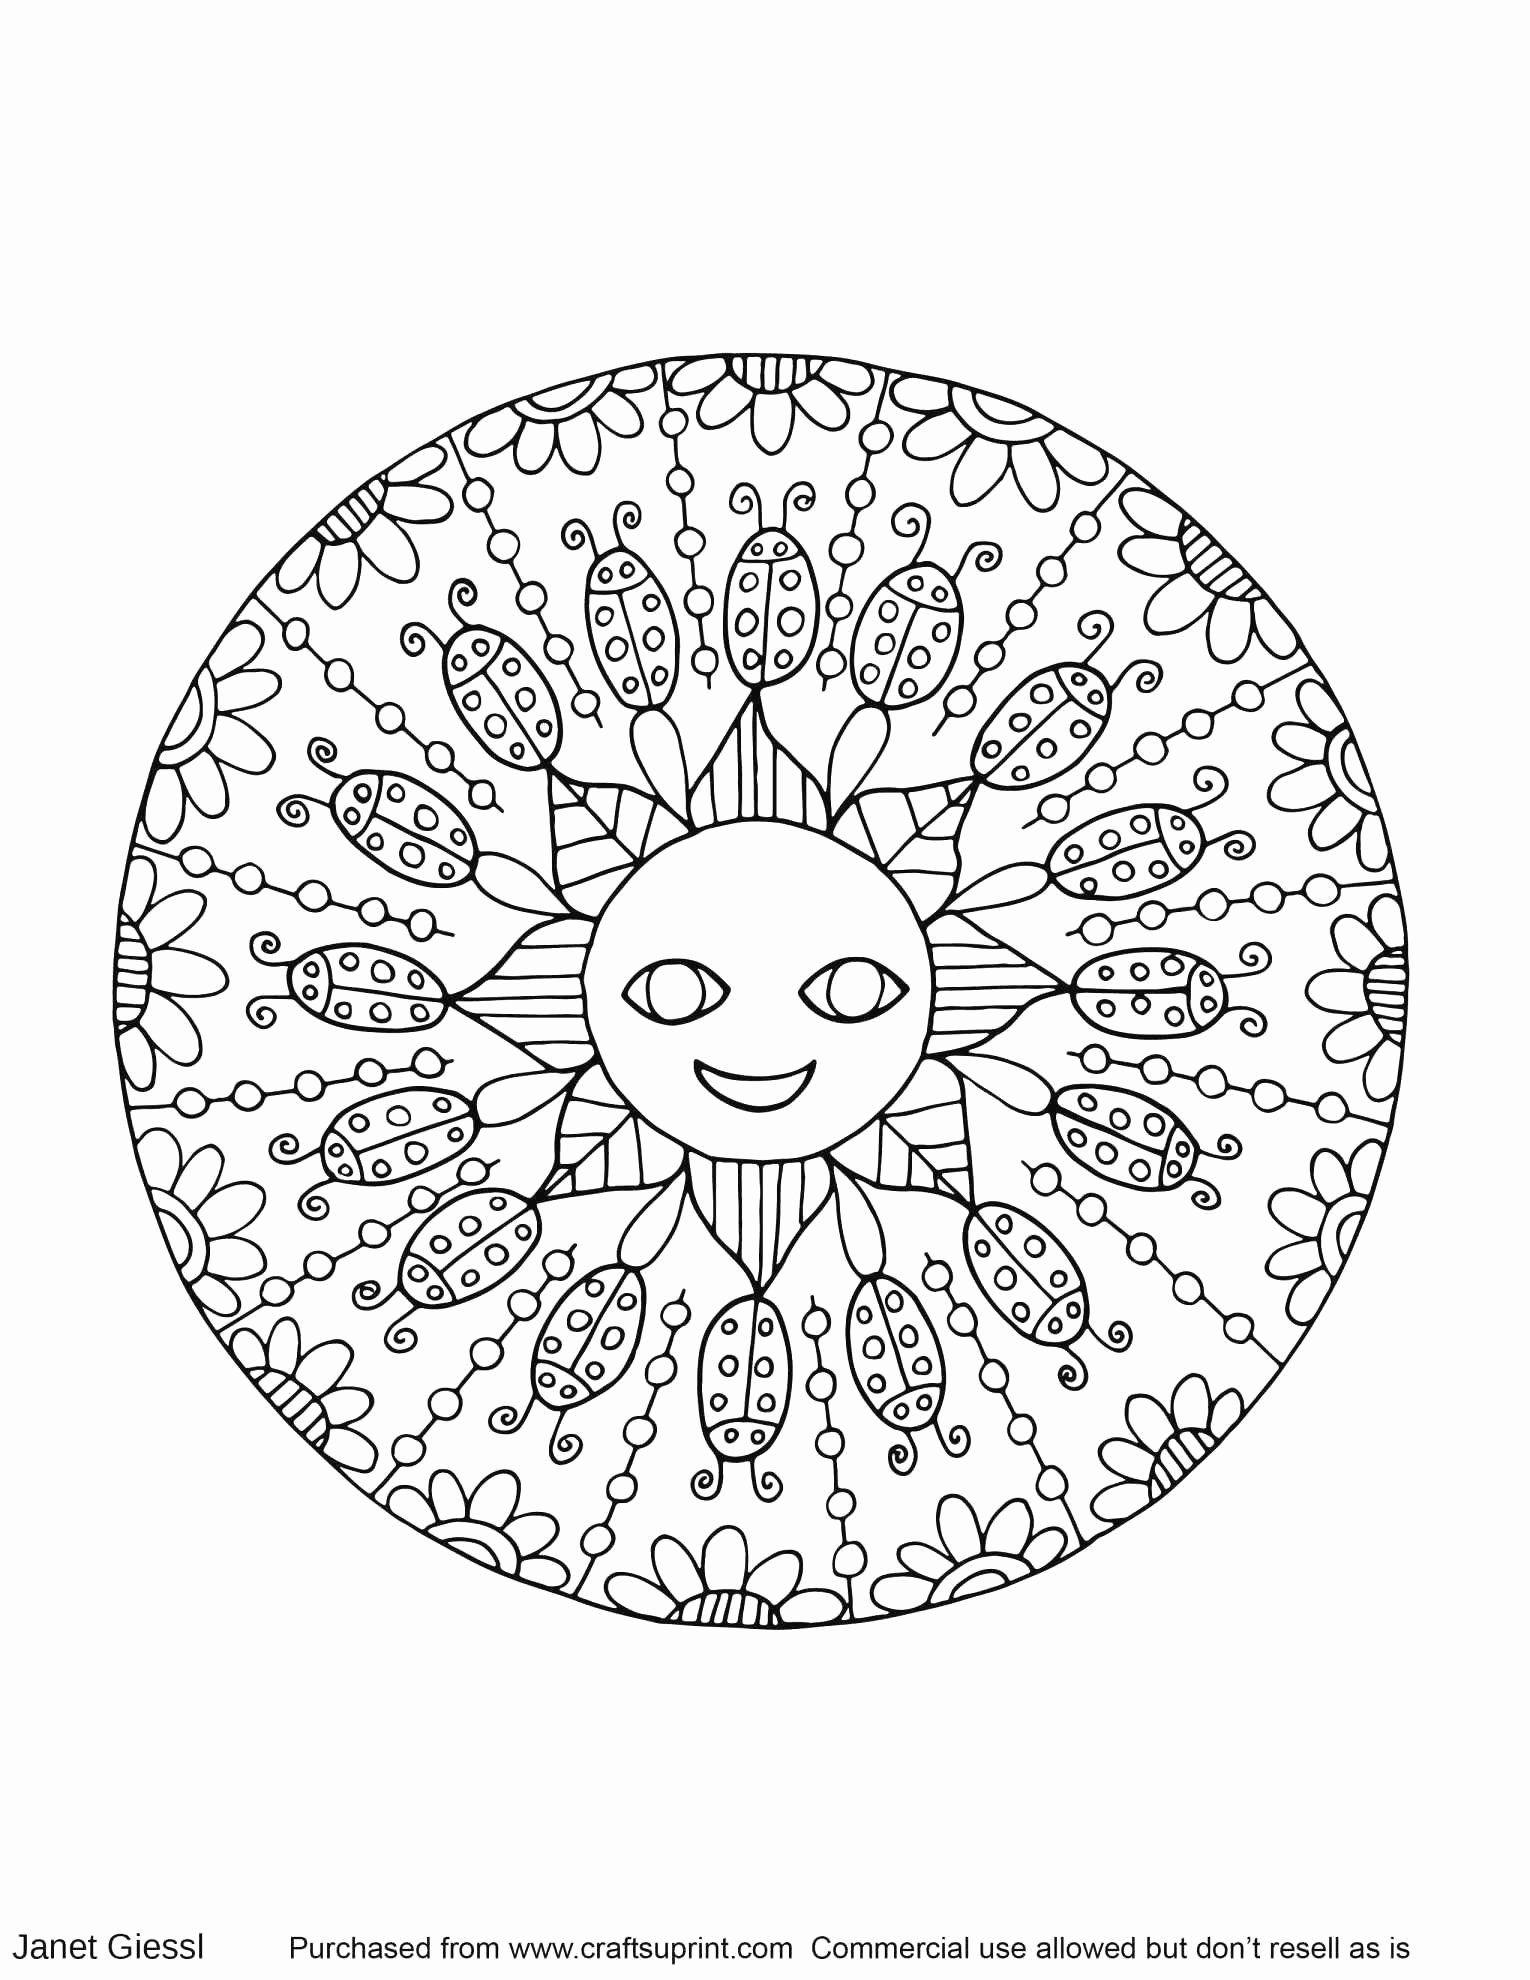 Patterned Pumpkin Coloring Page Jpg 2 550 3 300 Pixels Estampados Zentangle Plantillas Para Colorear Mandalas Imprimir